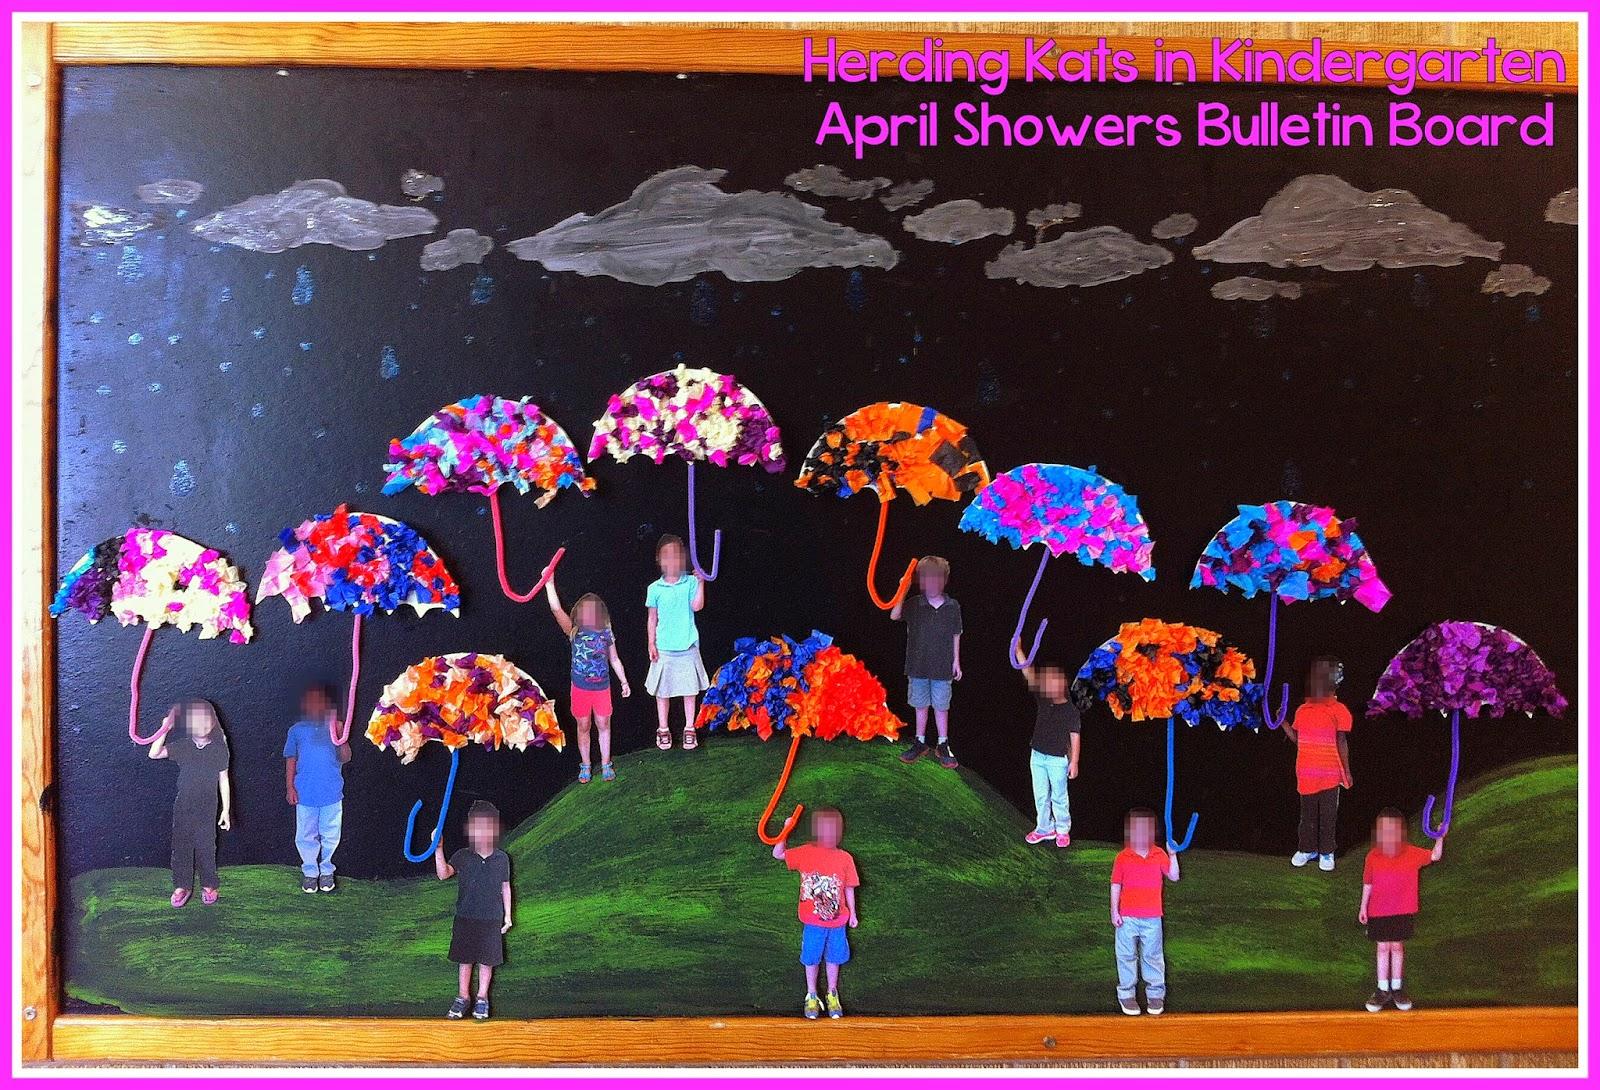 Herding Kats In Kindergarten April Showers Bulletin Board